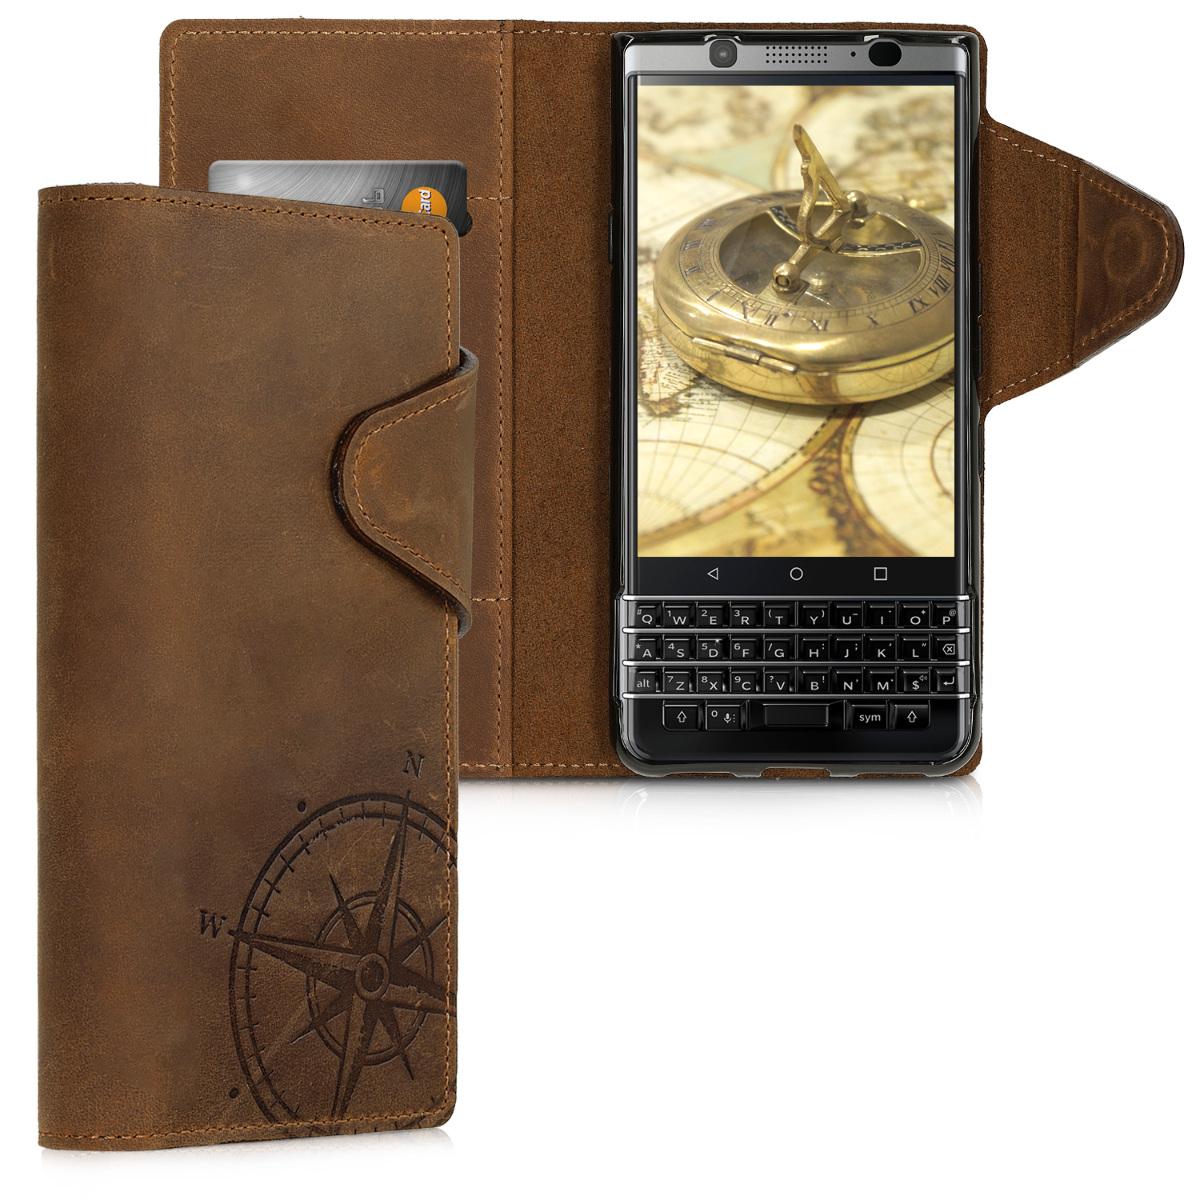 Kalibri Δερμάτινη Suede Θήκη - Πορτοφόλι Blackberry Keyone - Brown (46464.01)